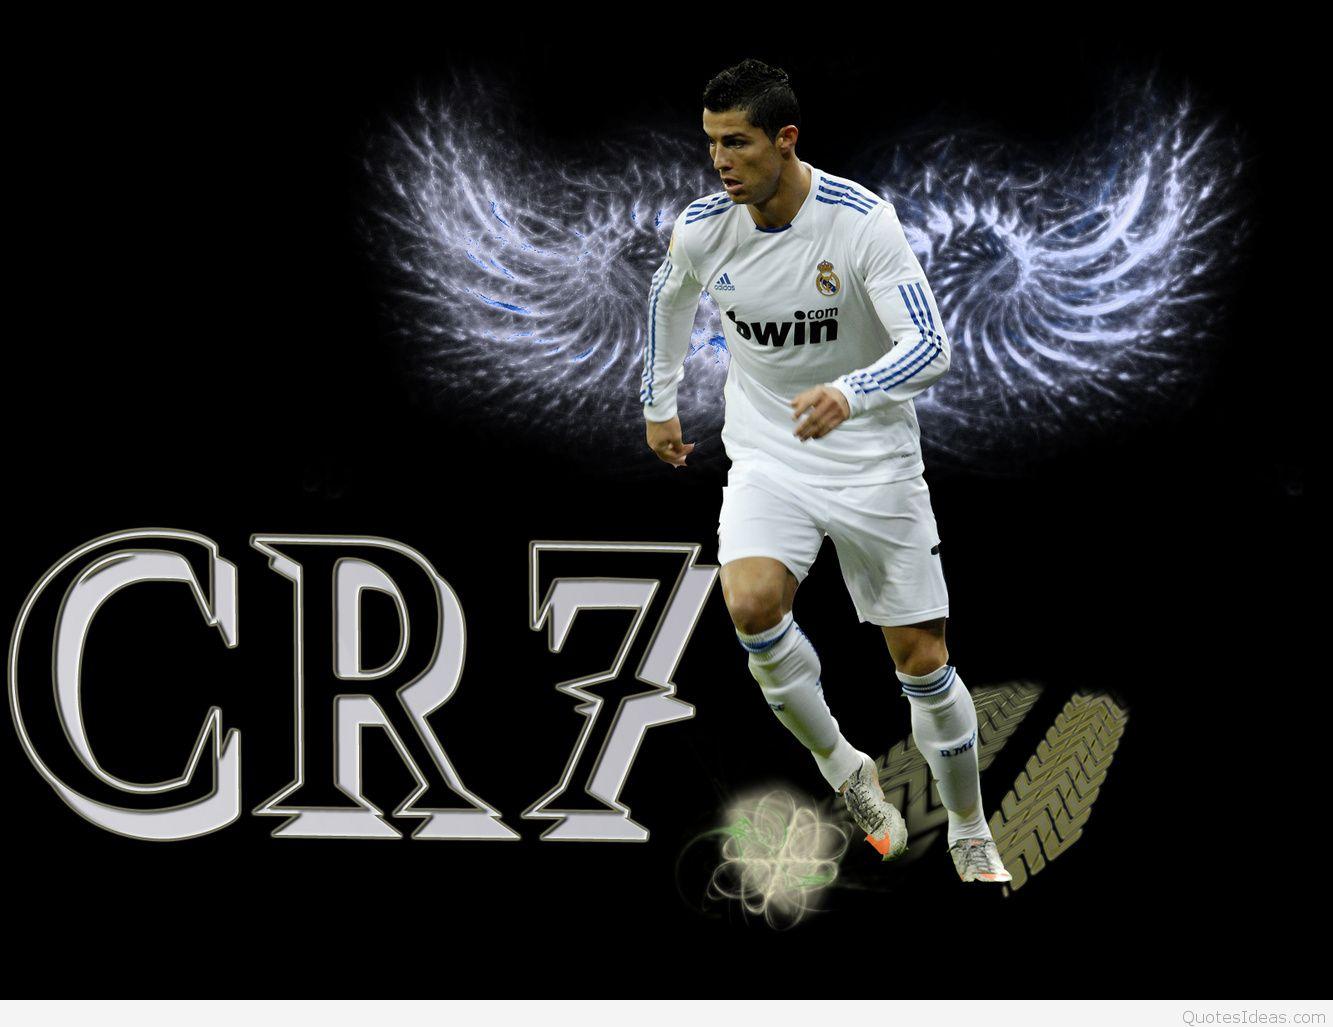 Cr7 Cool , HD Wallpaper & Backgrounds